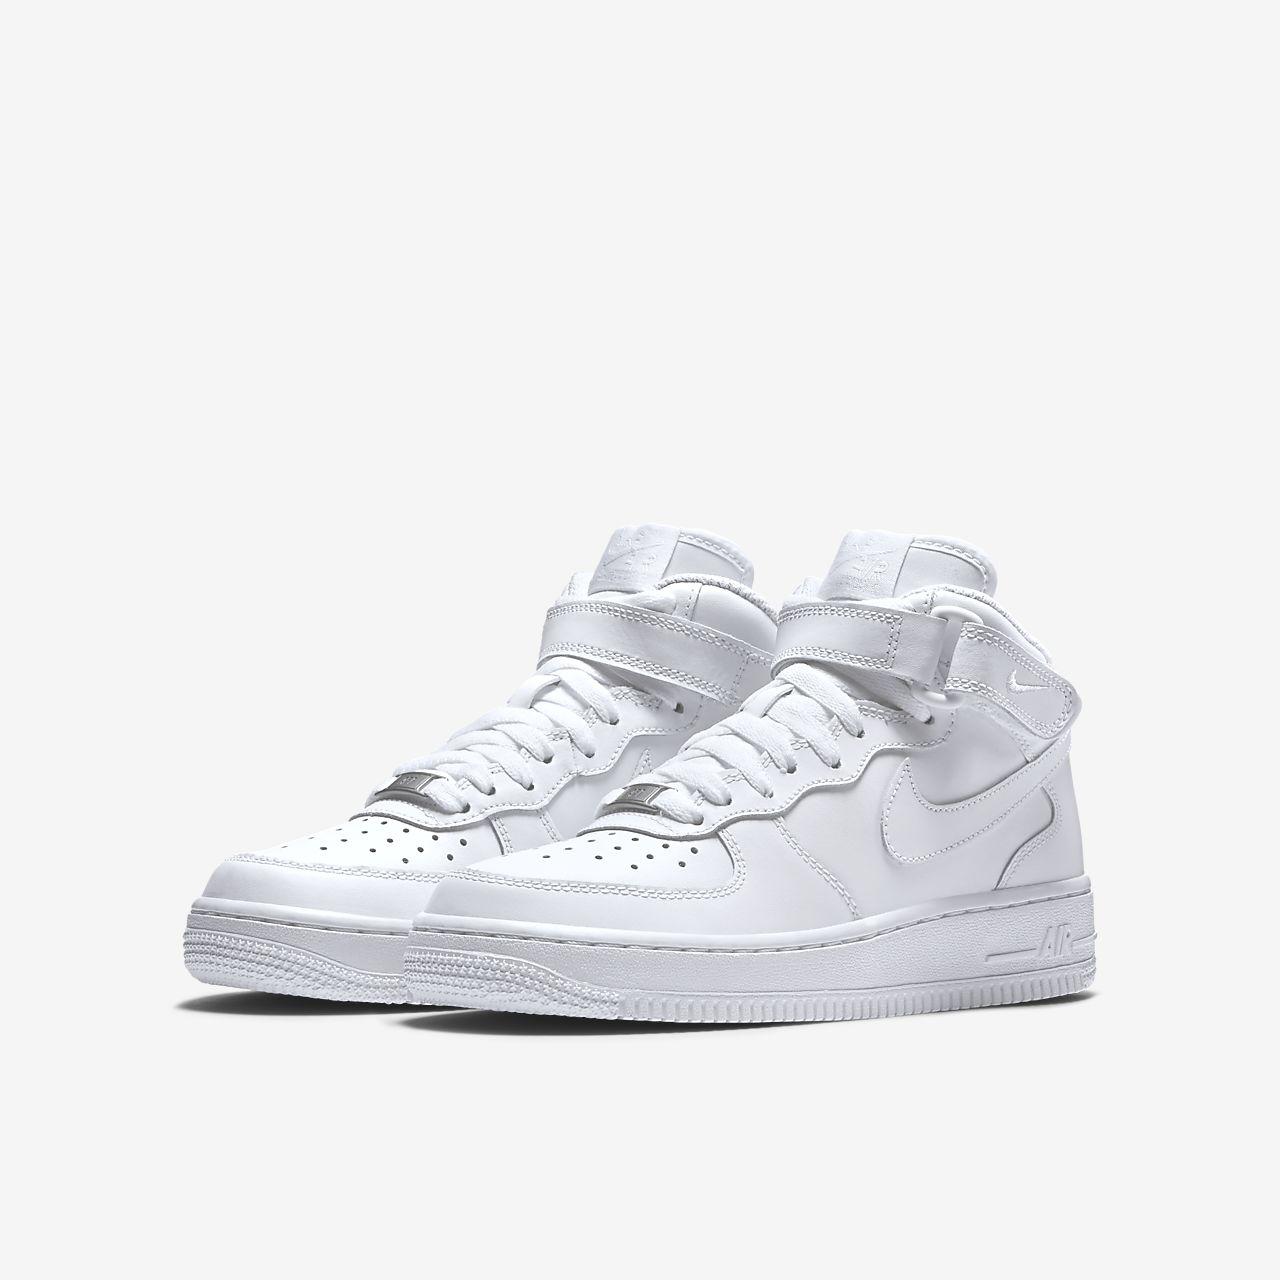 new style 99ccd b4c12 ... Nike Air Force 1 Mid 06 Big Kids  Shoe